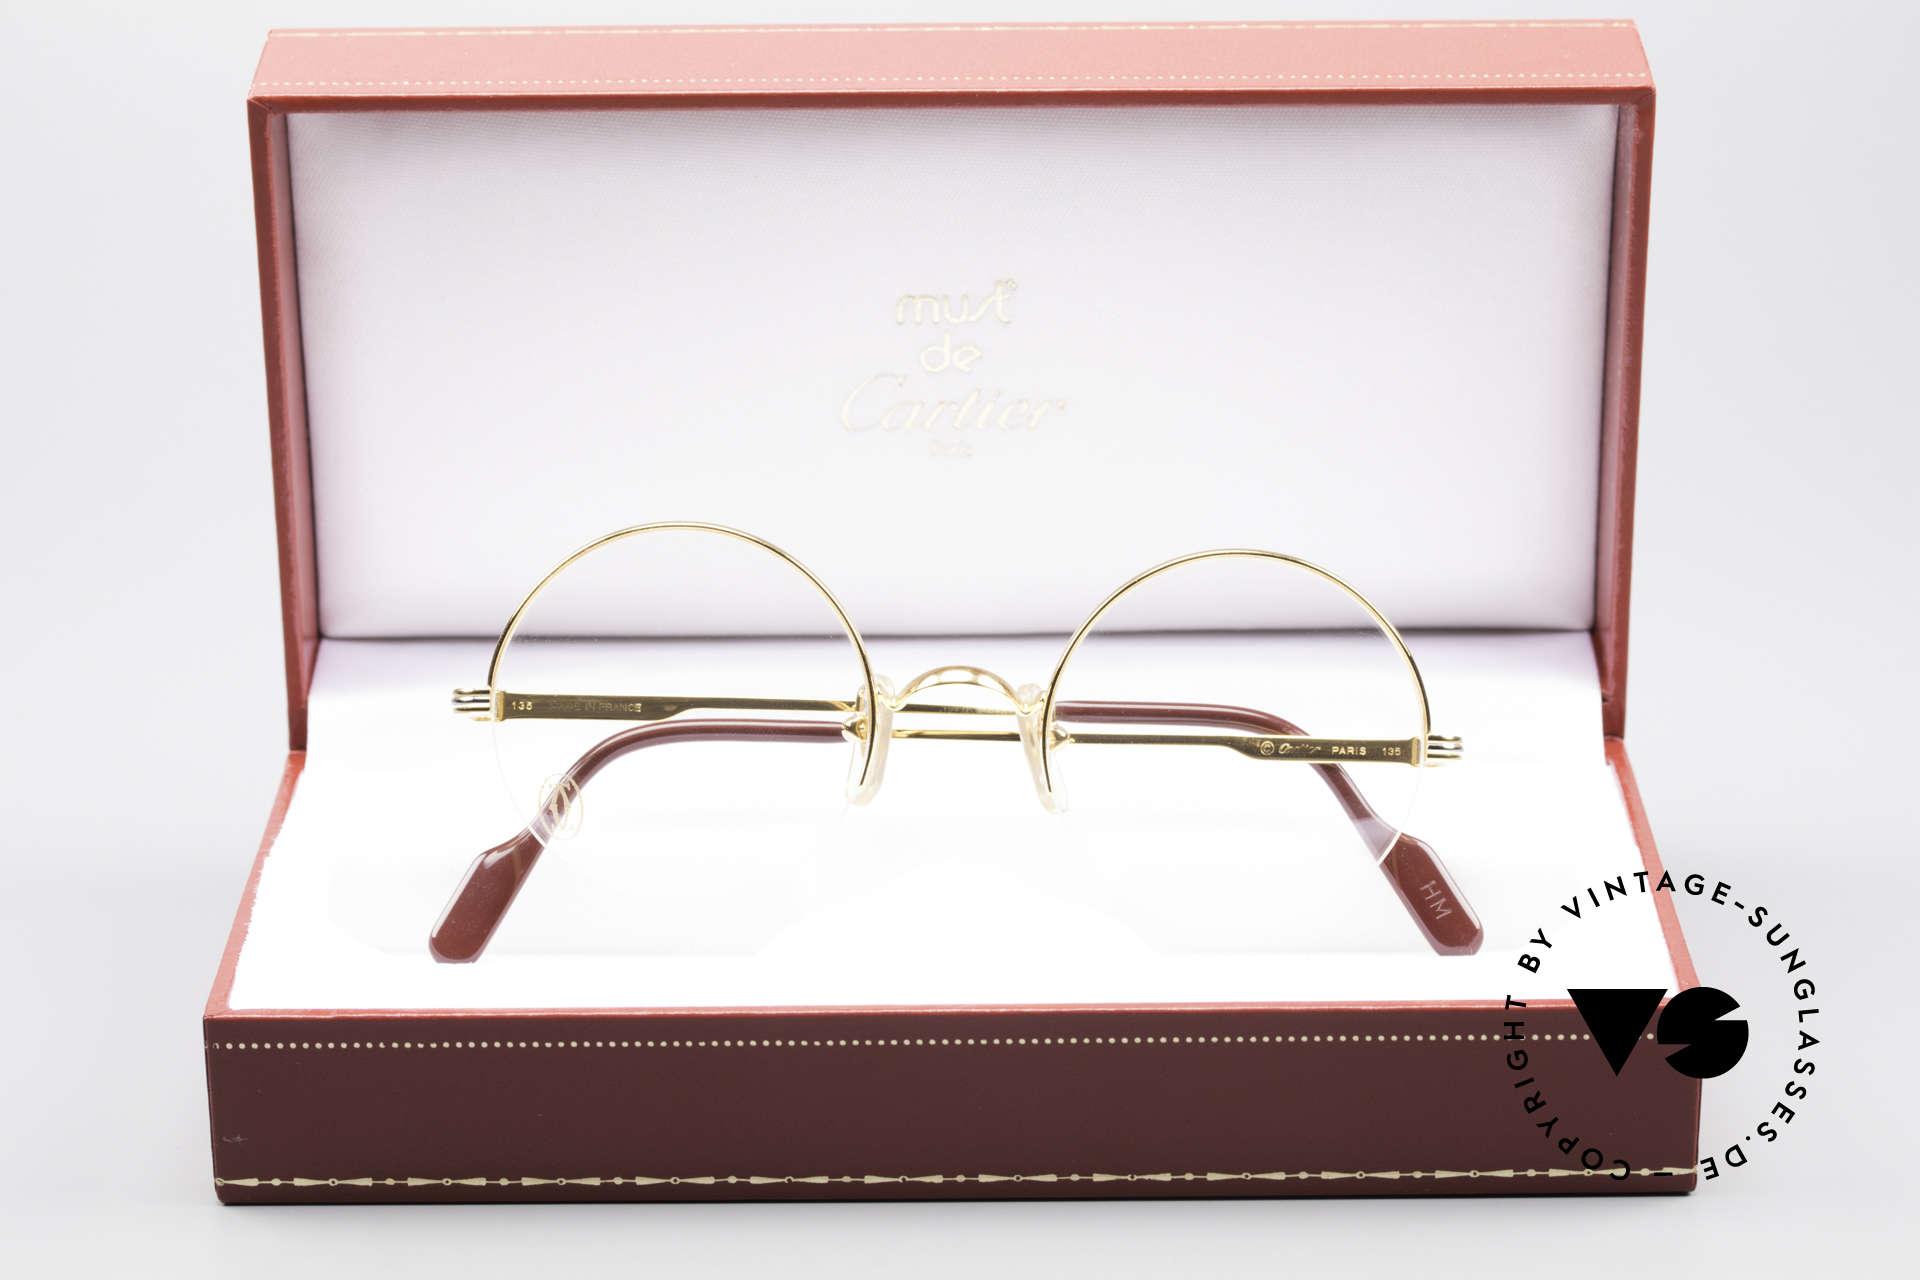 236dbc540 Glasses Cartier Mayfair - S Luxury Round Eyeglasses | Vintage Sunglasses